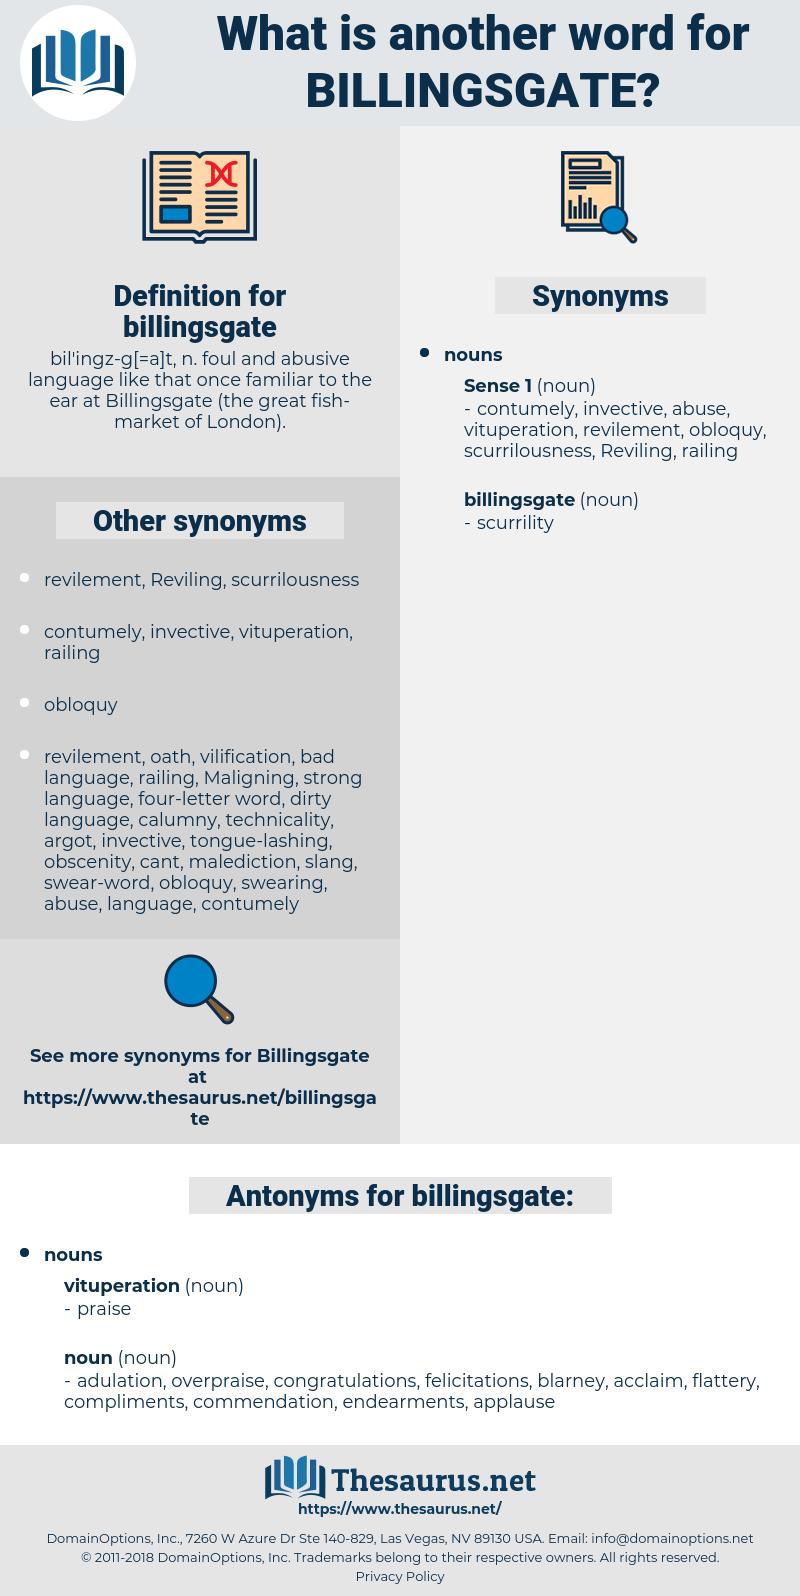 billingsgate, synonym billingsgate, another word for billingsgate, words like billingsgate, thesaurus billingsgate